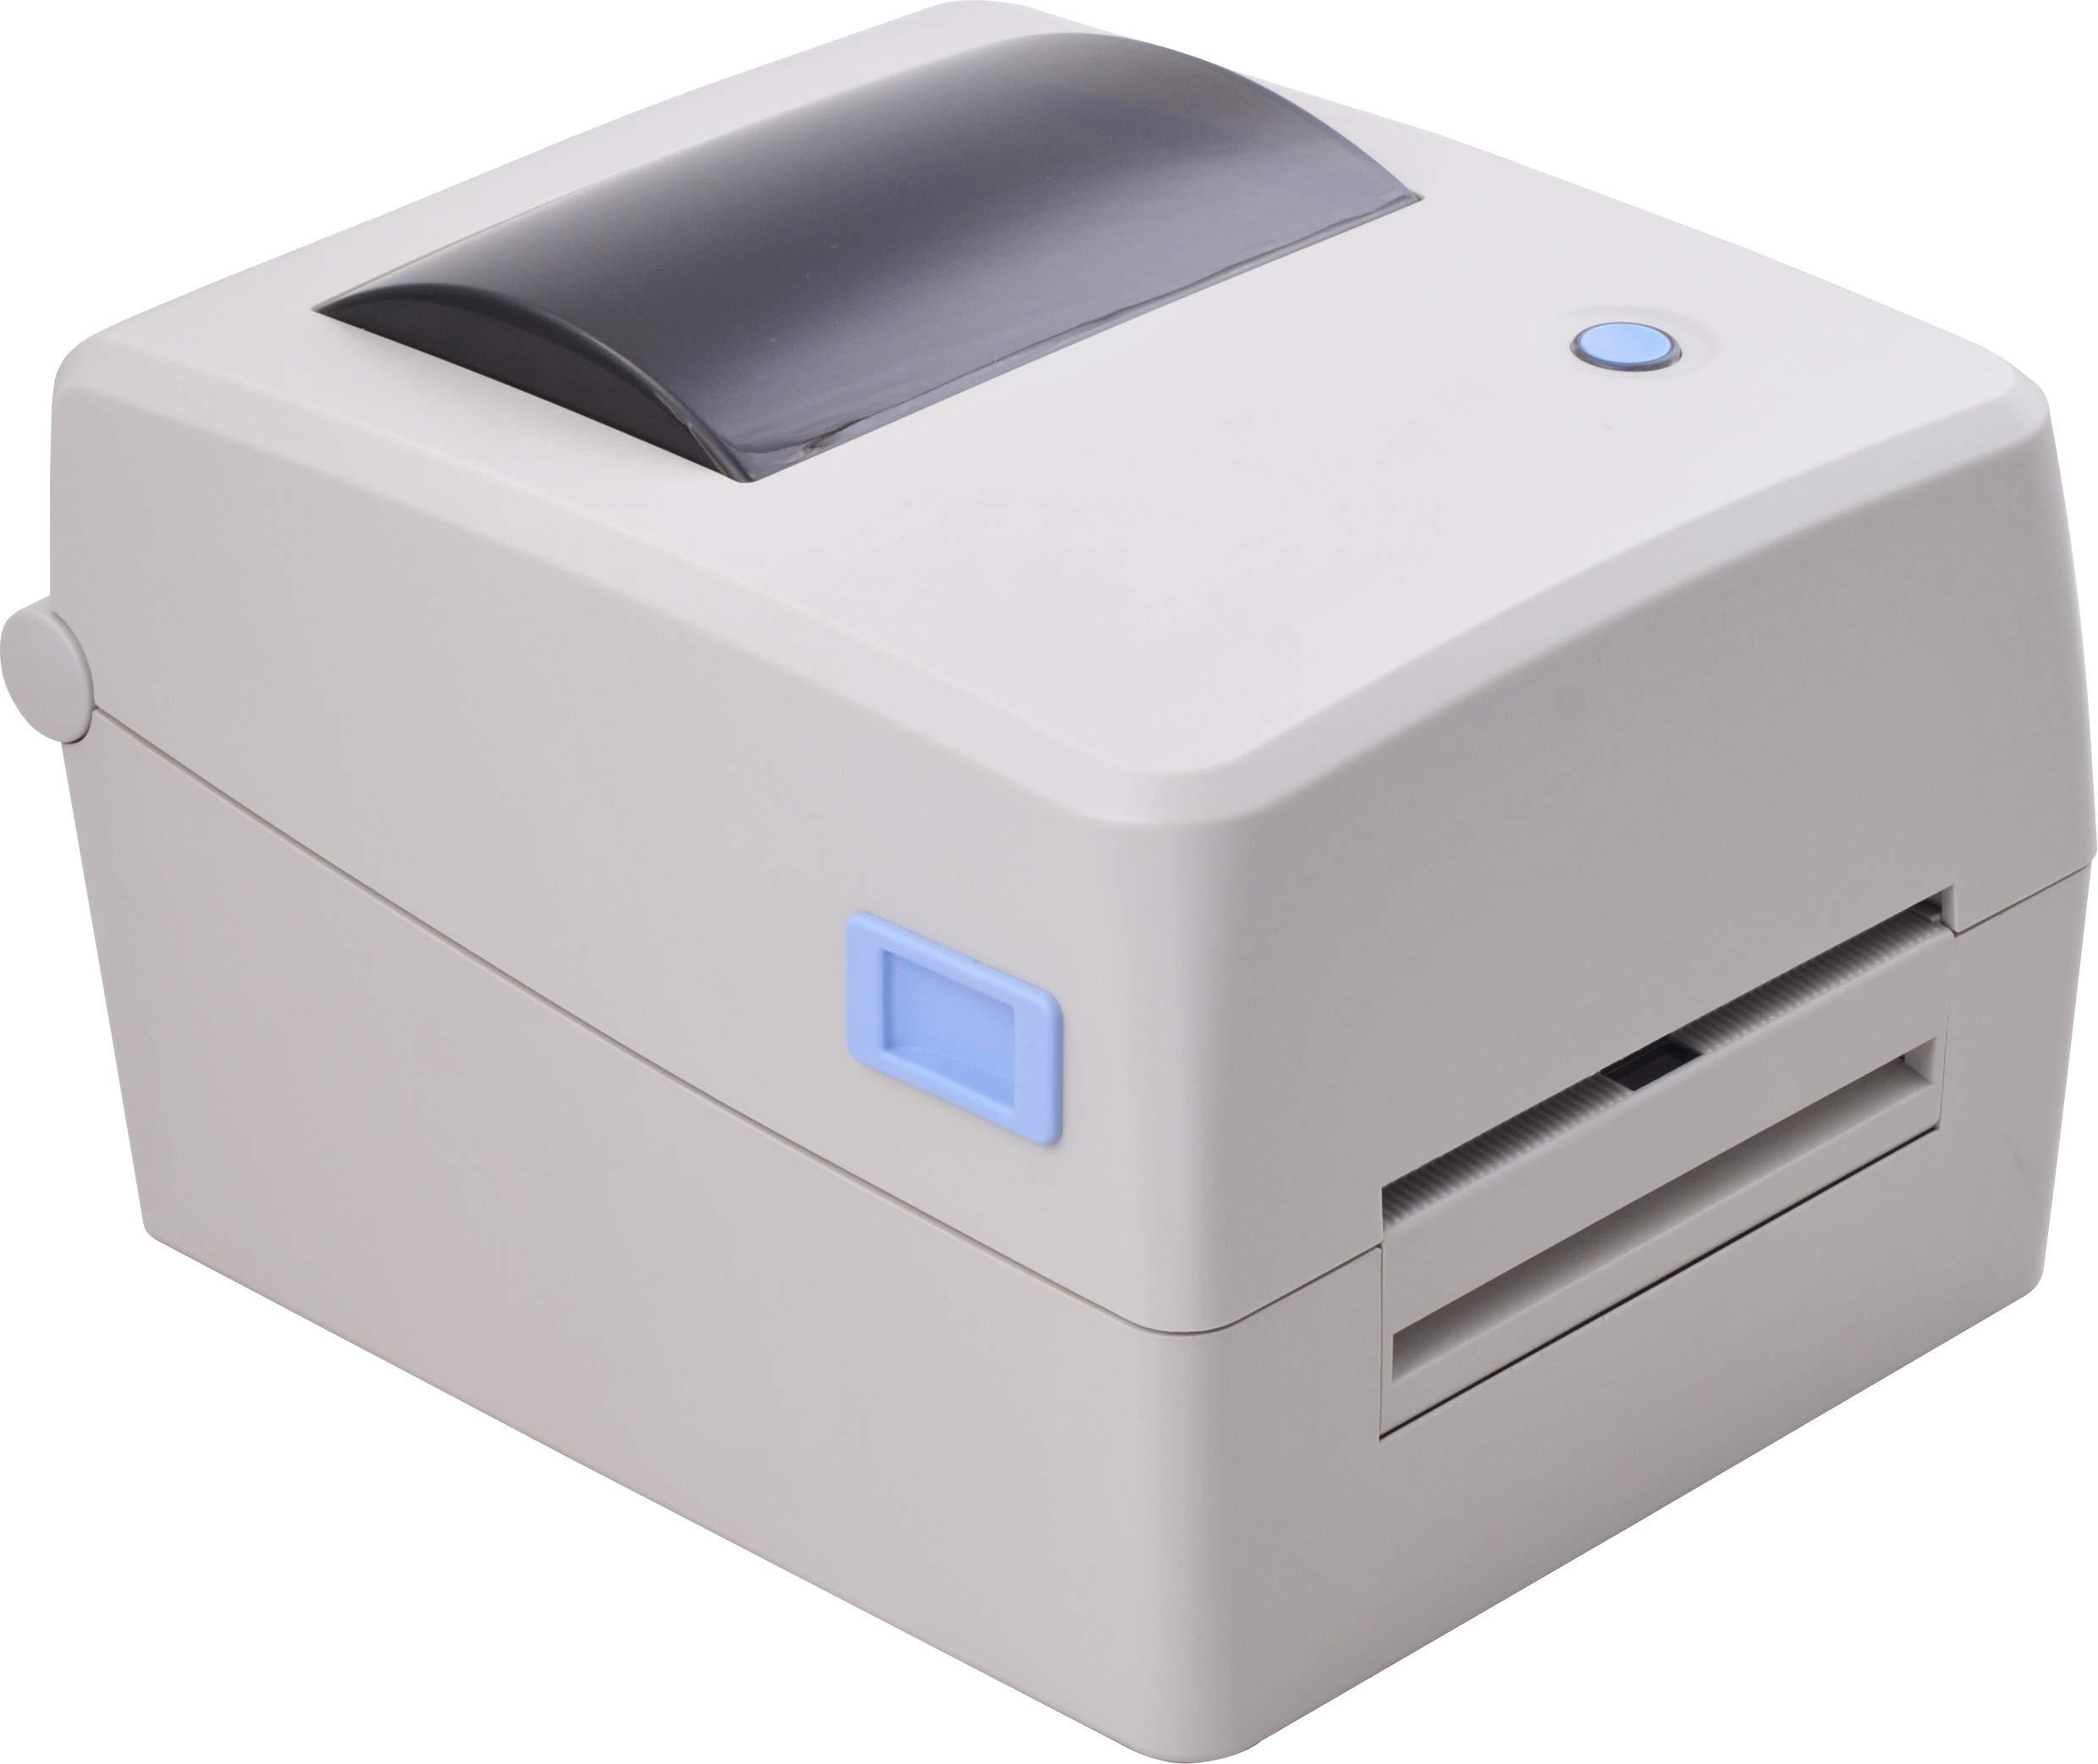 Xprinter XP-TT424B 110mm 4.3inch 203dpi Thermal and Thermal-Transfer Label Printer,Thermal and Thermal-Transfer Barcode Printer, USB 2.0 Interface